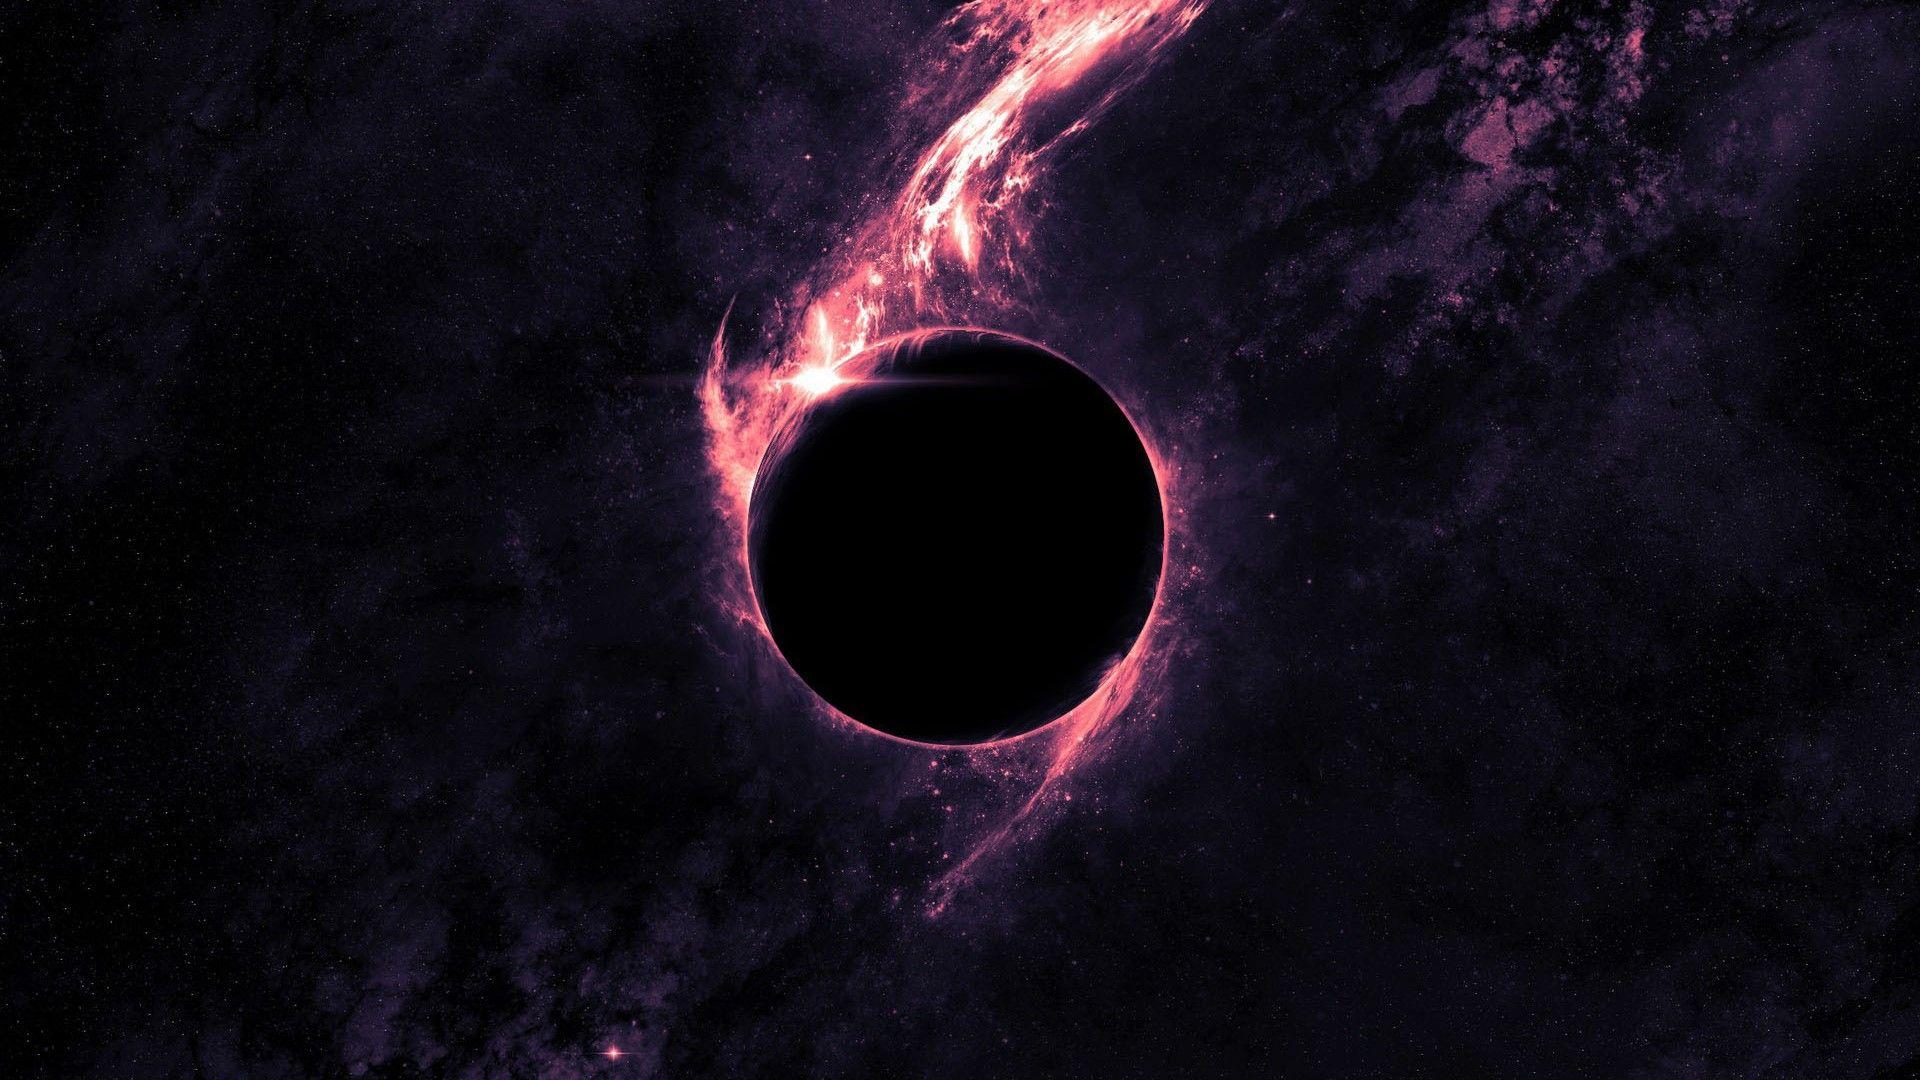 Higher Education S Event Horizon Black Hole Wallpaper Dark Purple Wallpaper Black Hole